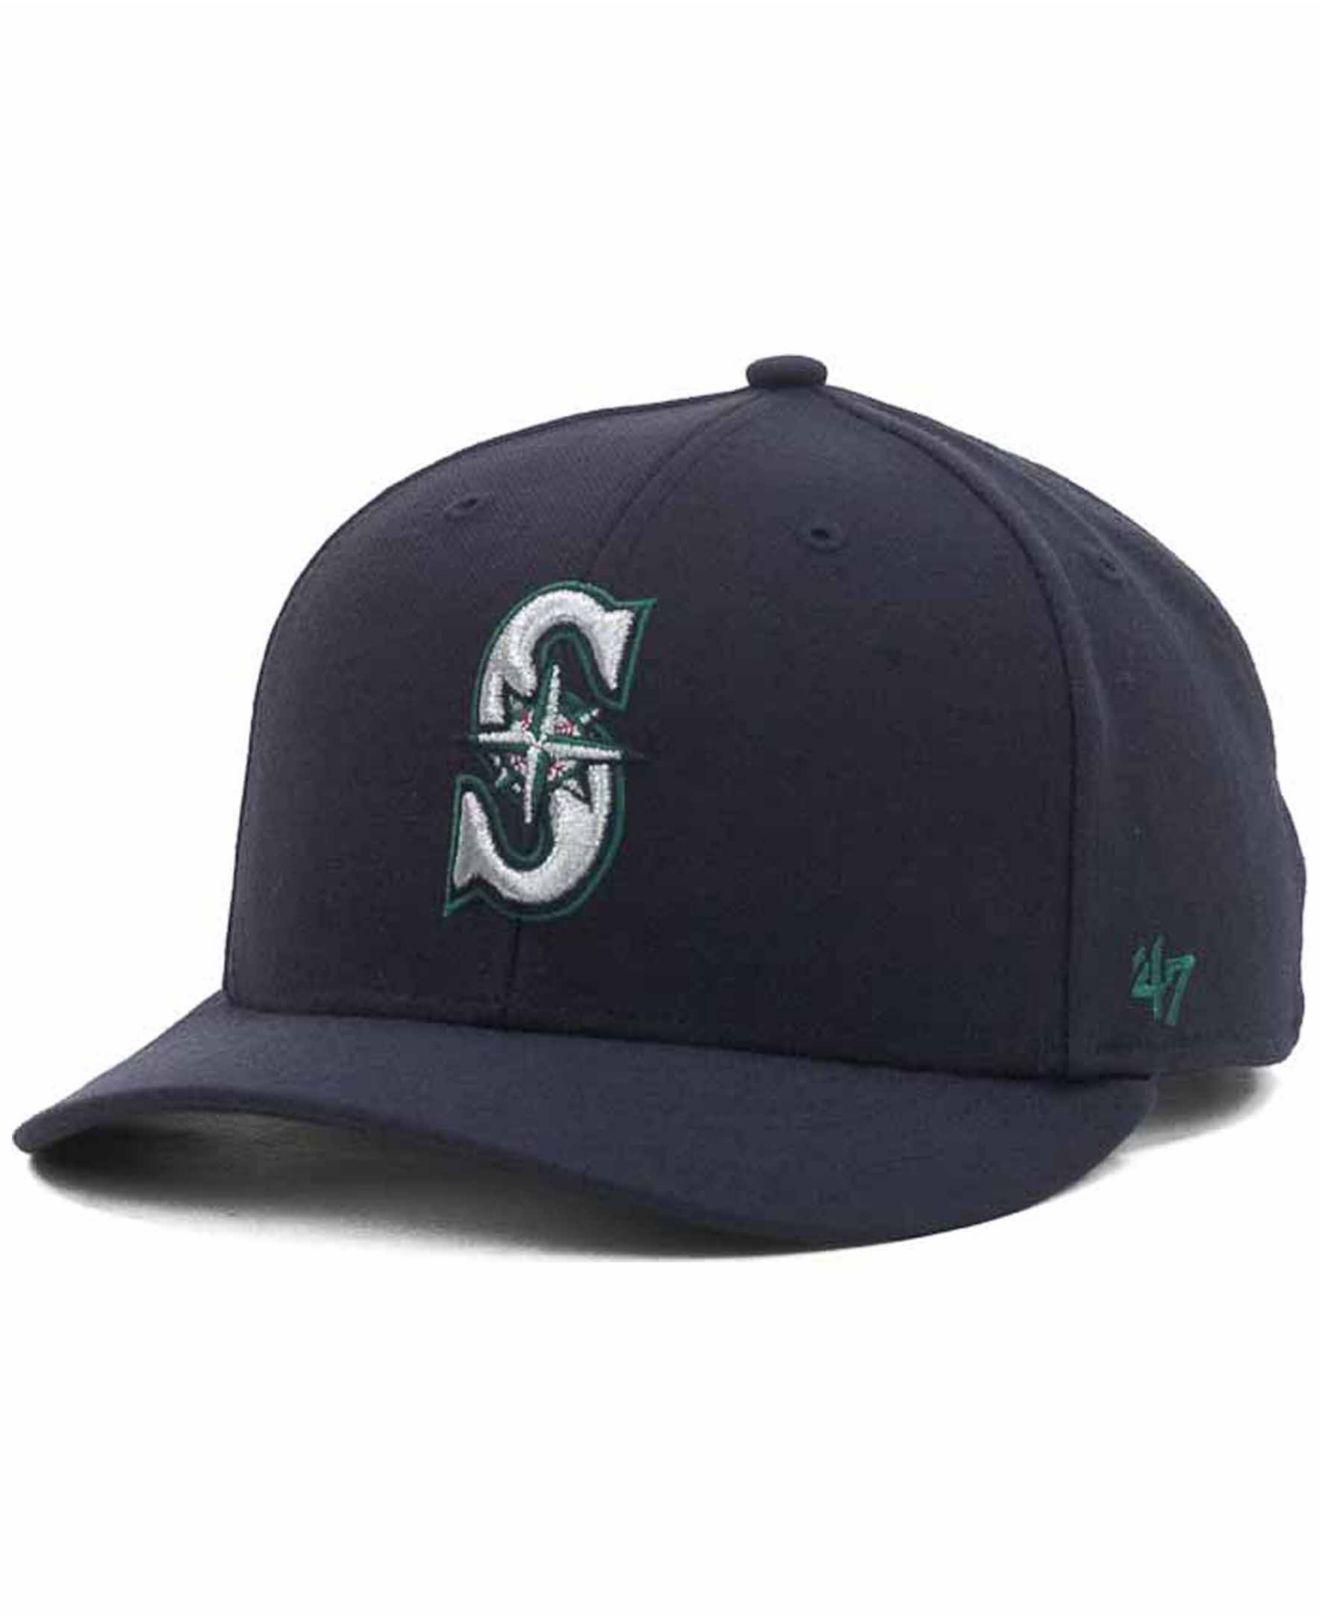 best service b6409 99e60 47 Brand. Men s Blue Seattle Mariners Mlb On Field Replica Mvp Cap